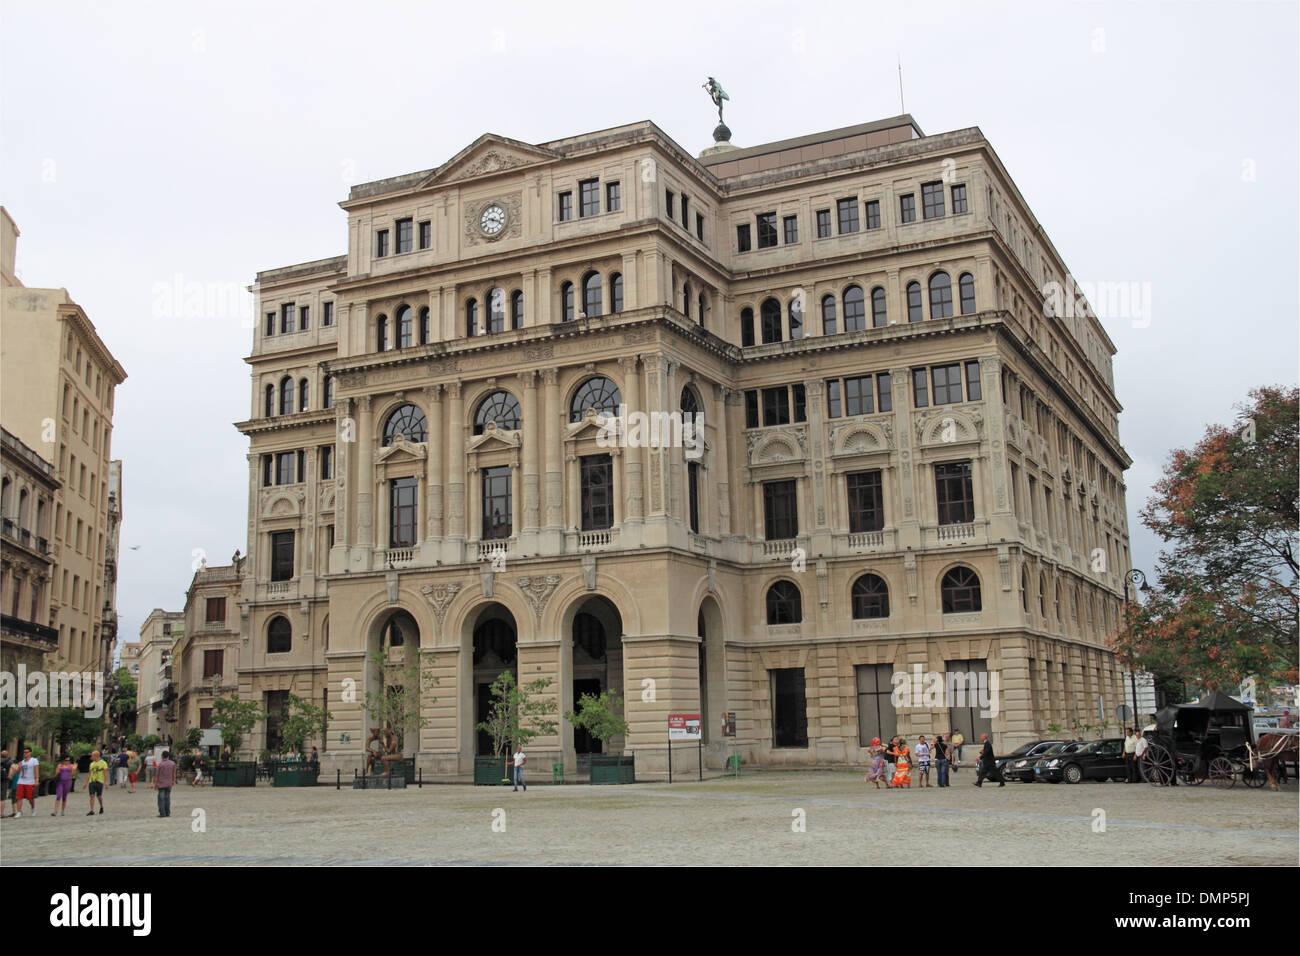 Lonja del Comercio (former Stock Market), Plaza de San Francisco, Old Havana (La Habana Vieja), Cuba, Caribbean Stock Photo